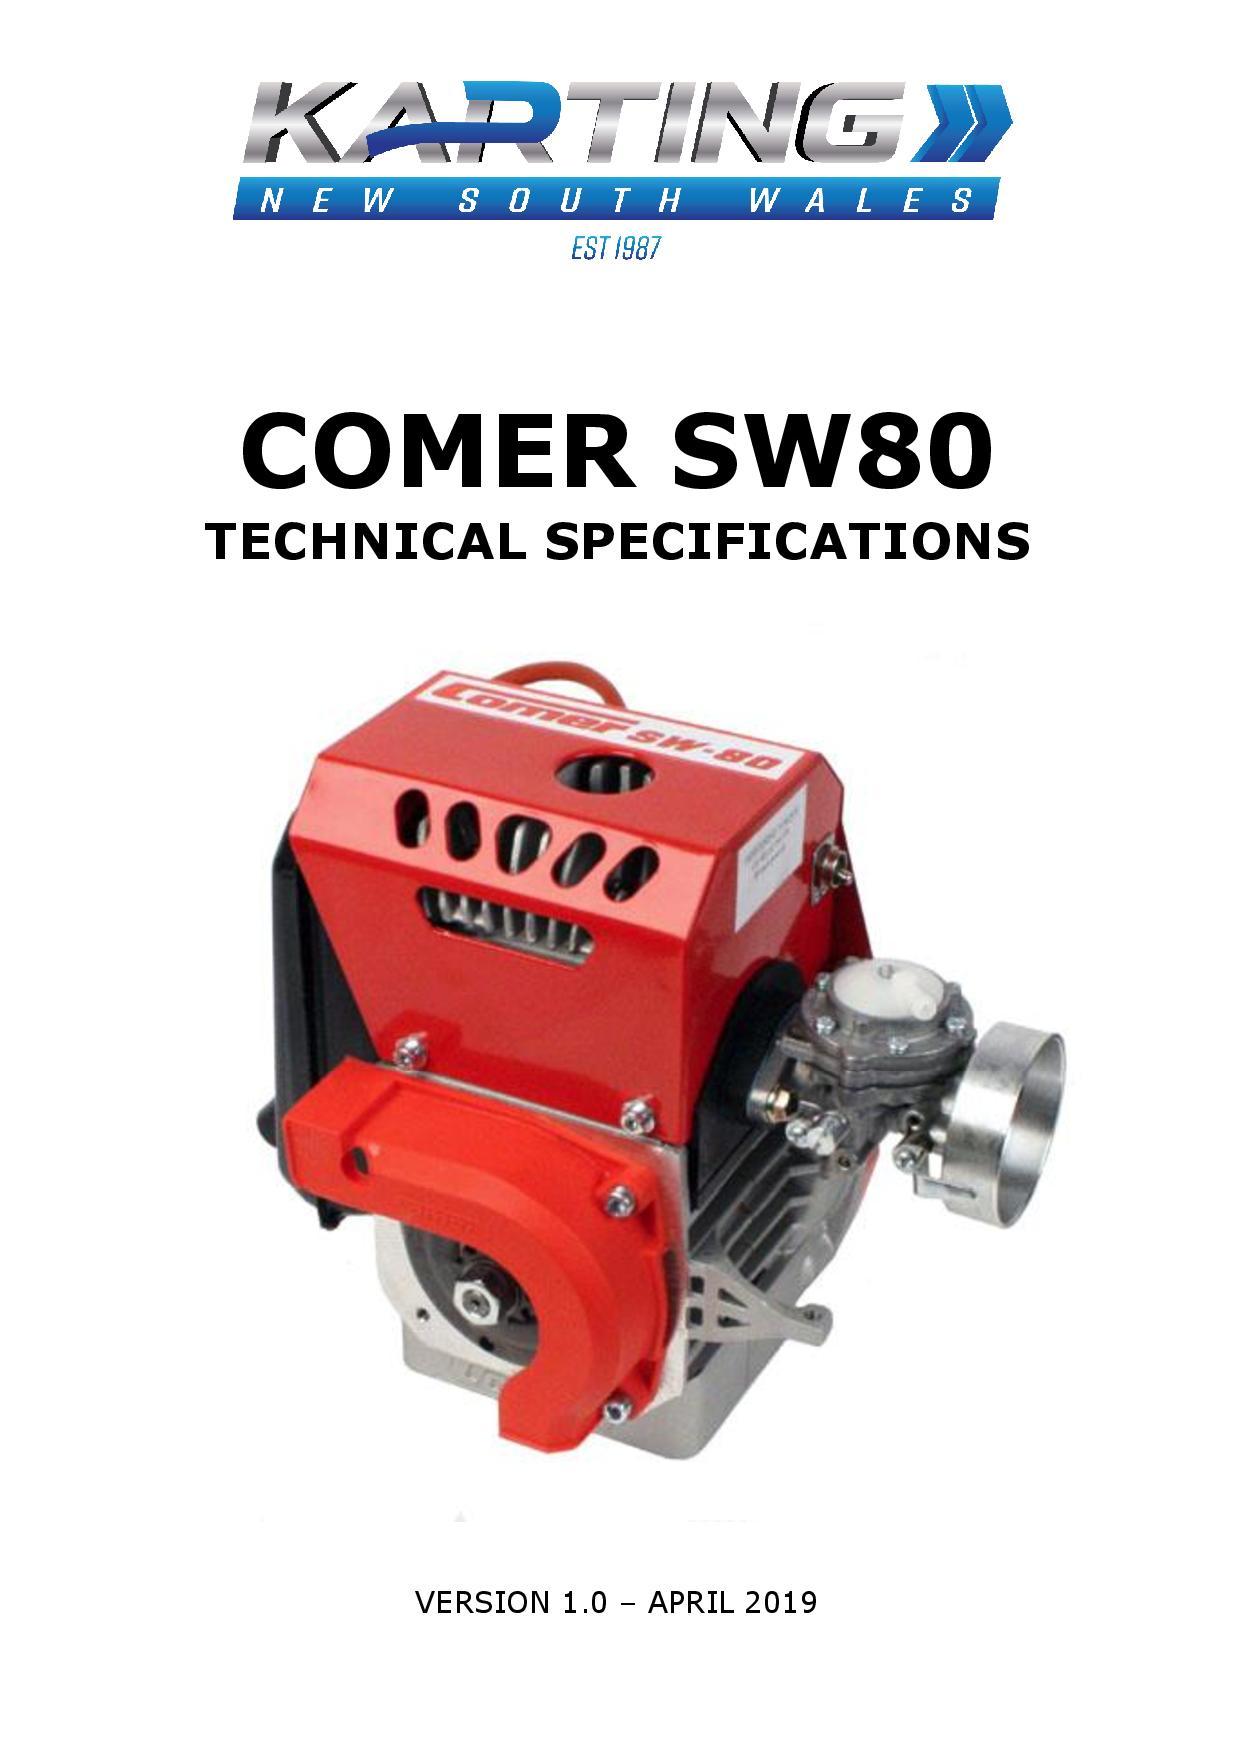 E21_Comer SW80